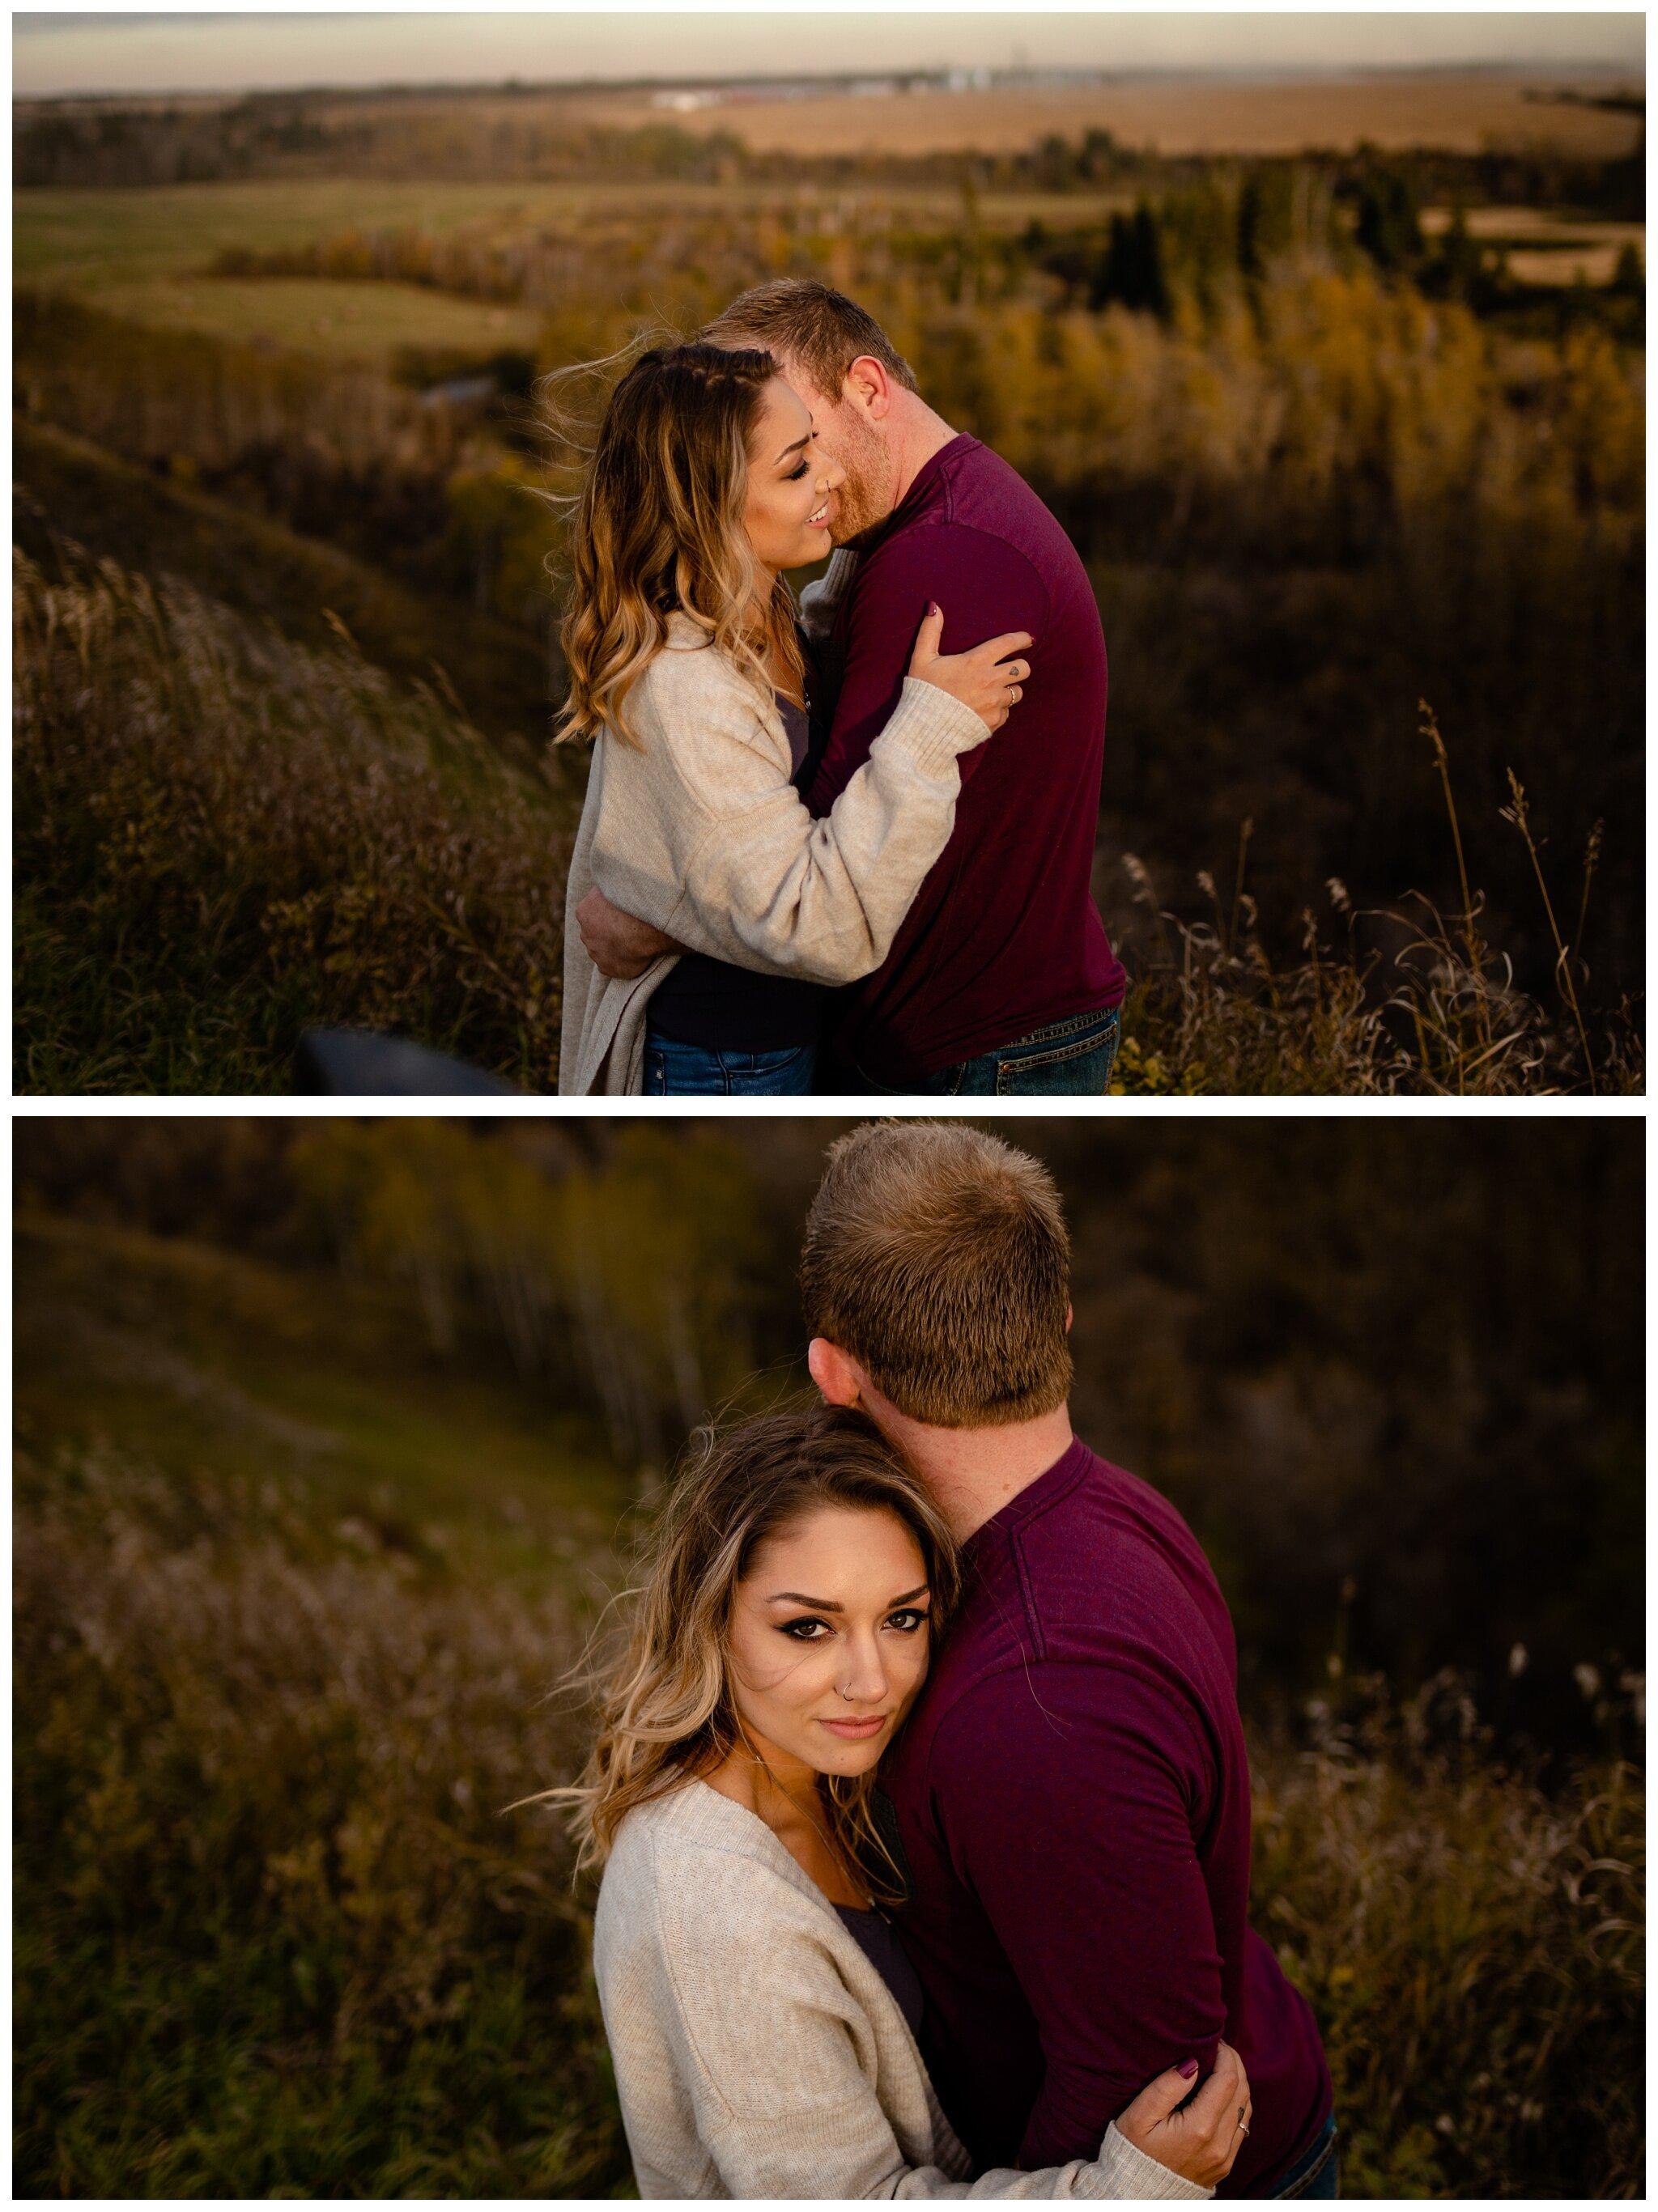 Edmonton Engagement Photographer Romantic Couples Photos Local YEG Strathcona County_0001.jpg